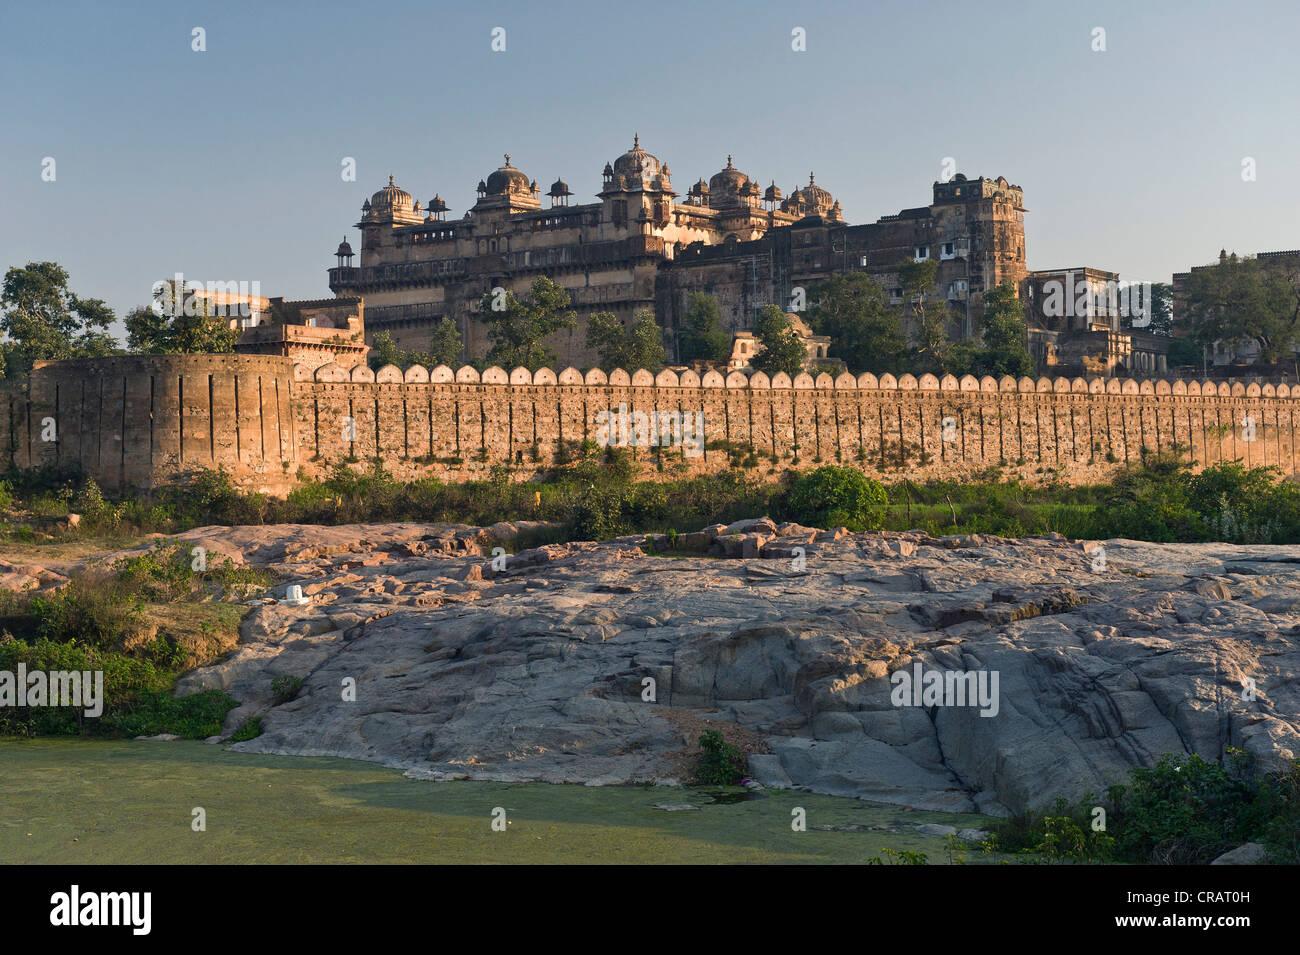 Raj Mahal Palast, Orchha, Madhya Pradesh, Nordindien, Indien, Asien - Stock Image